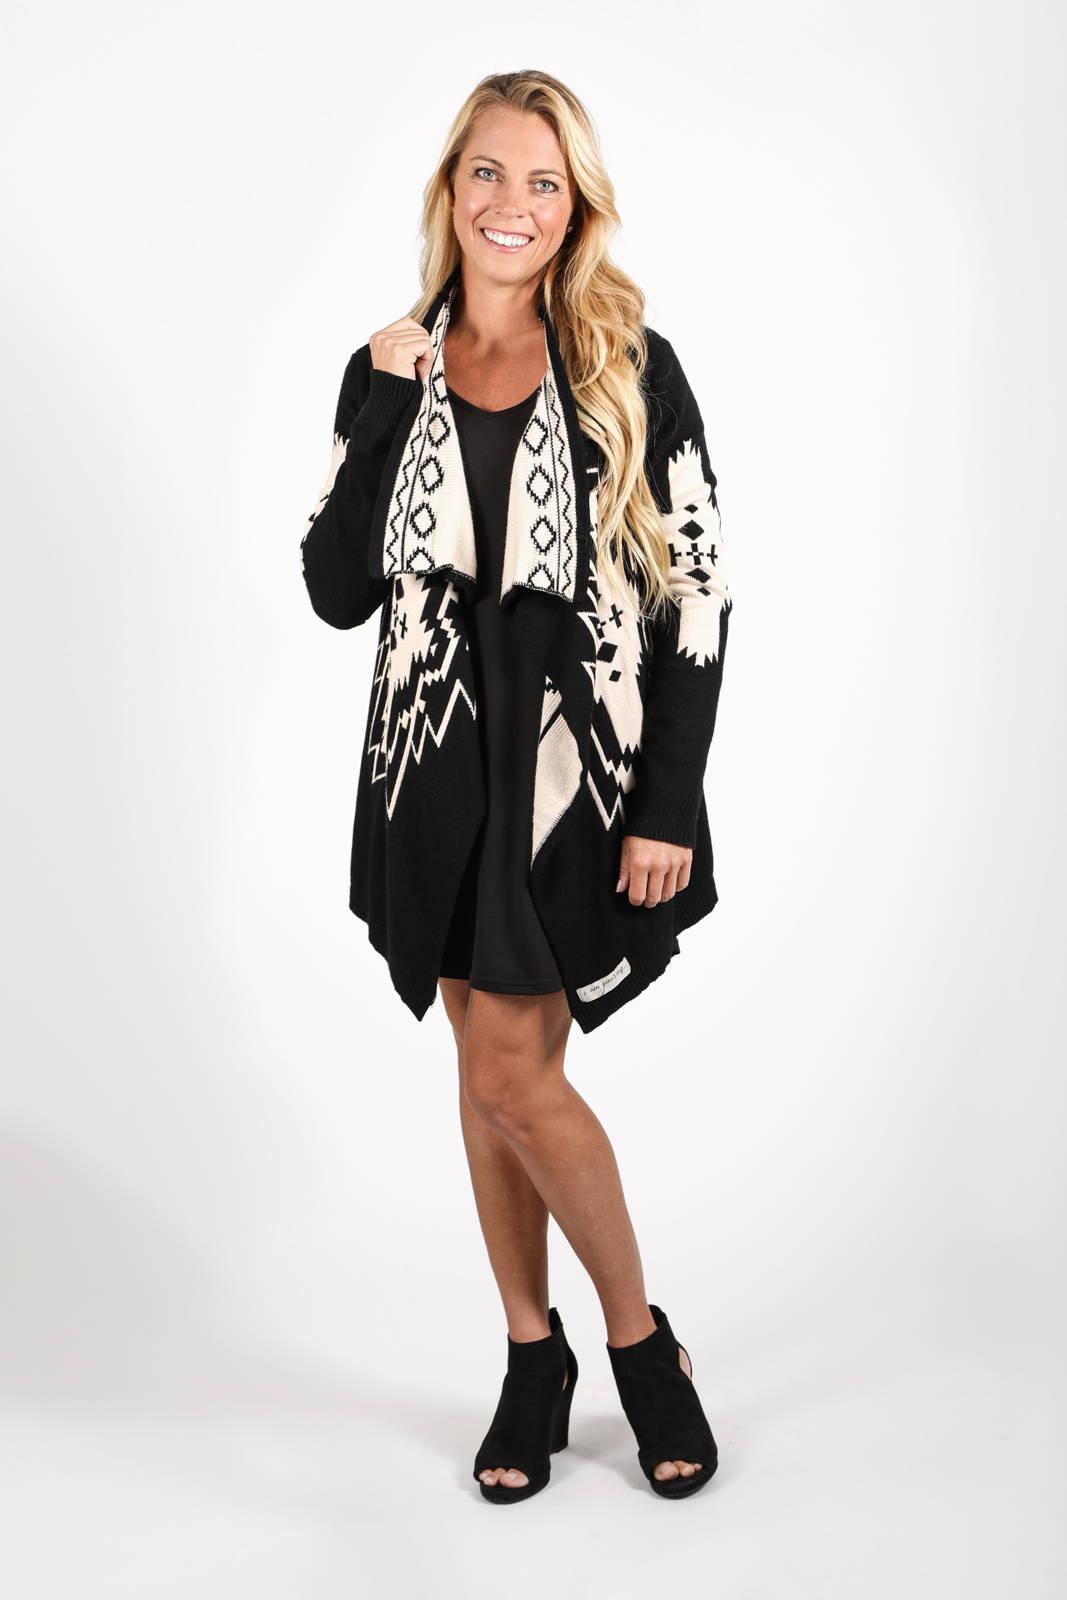 Model wearing the Nani Cardigan over the Ina long Sleeve Dress by illuminative